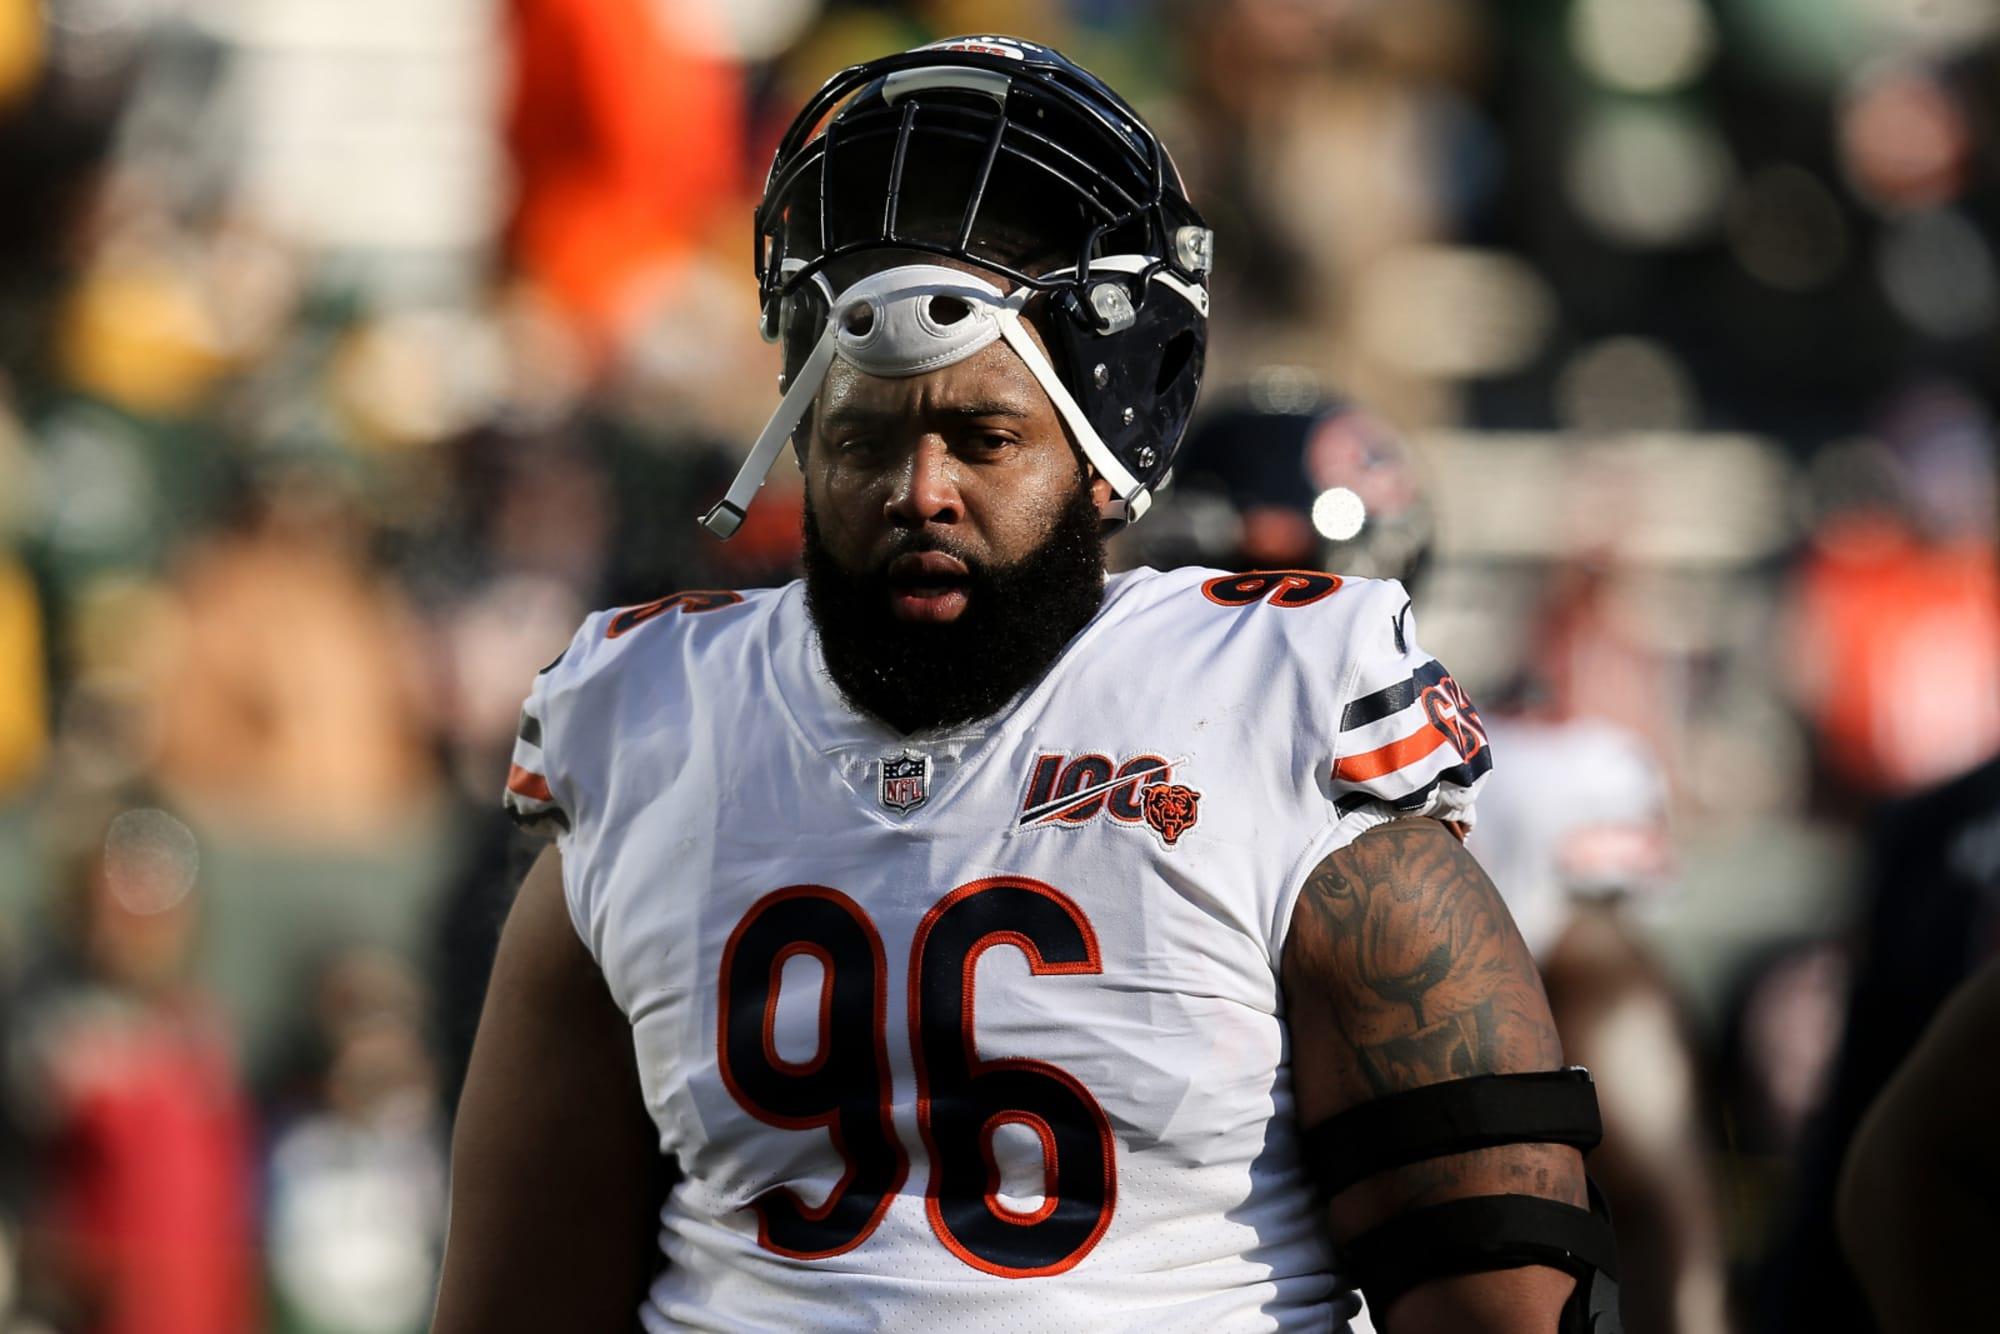 Chicago Bears 2020 roster ranking: 6